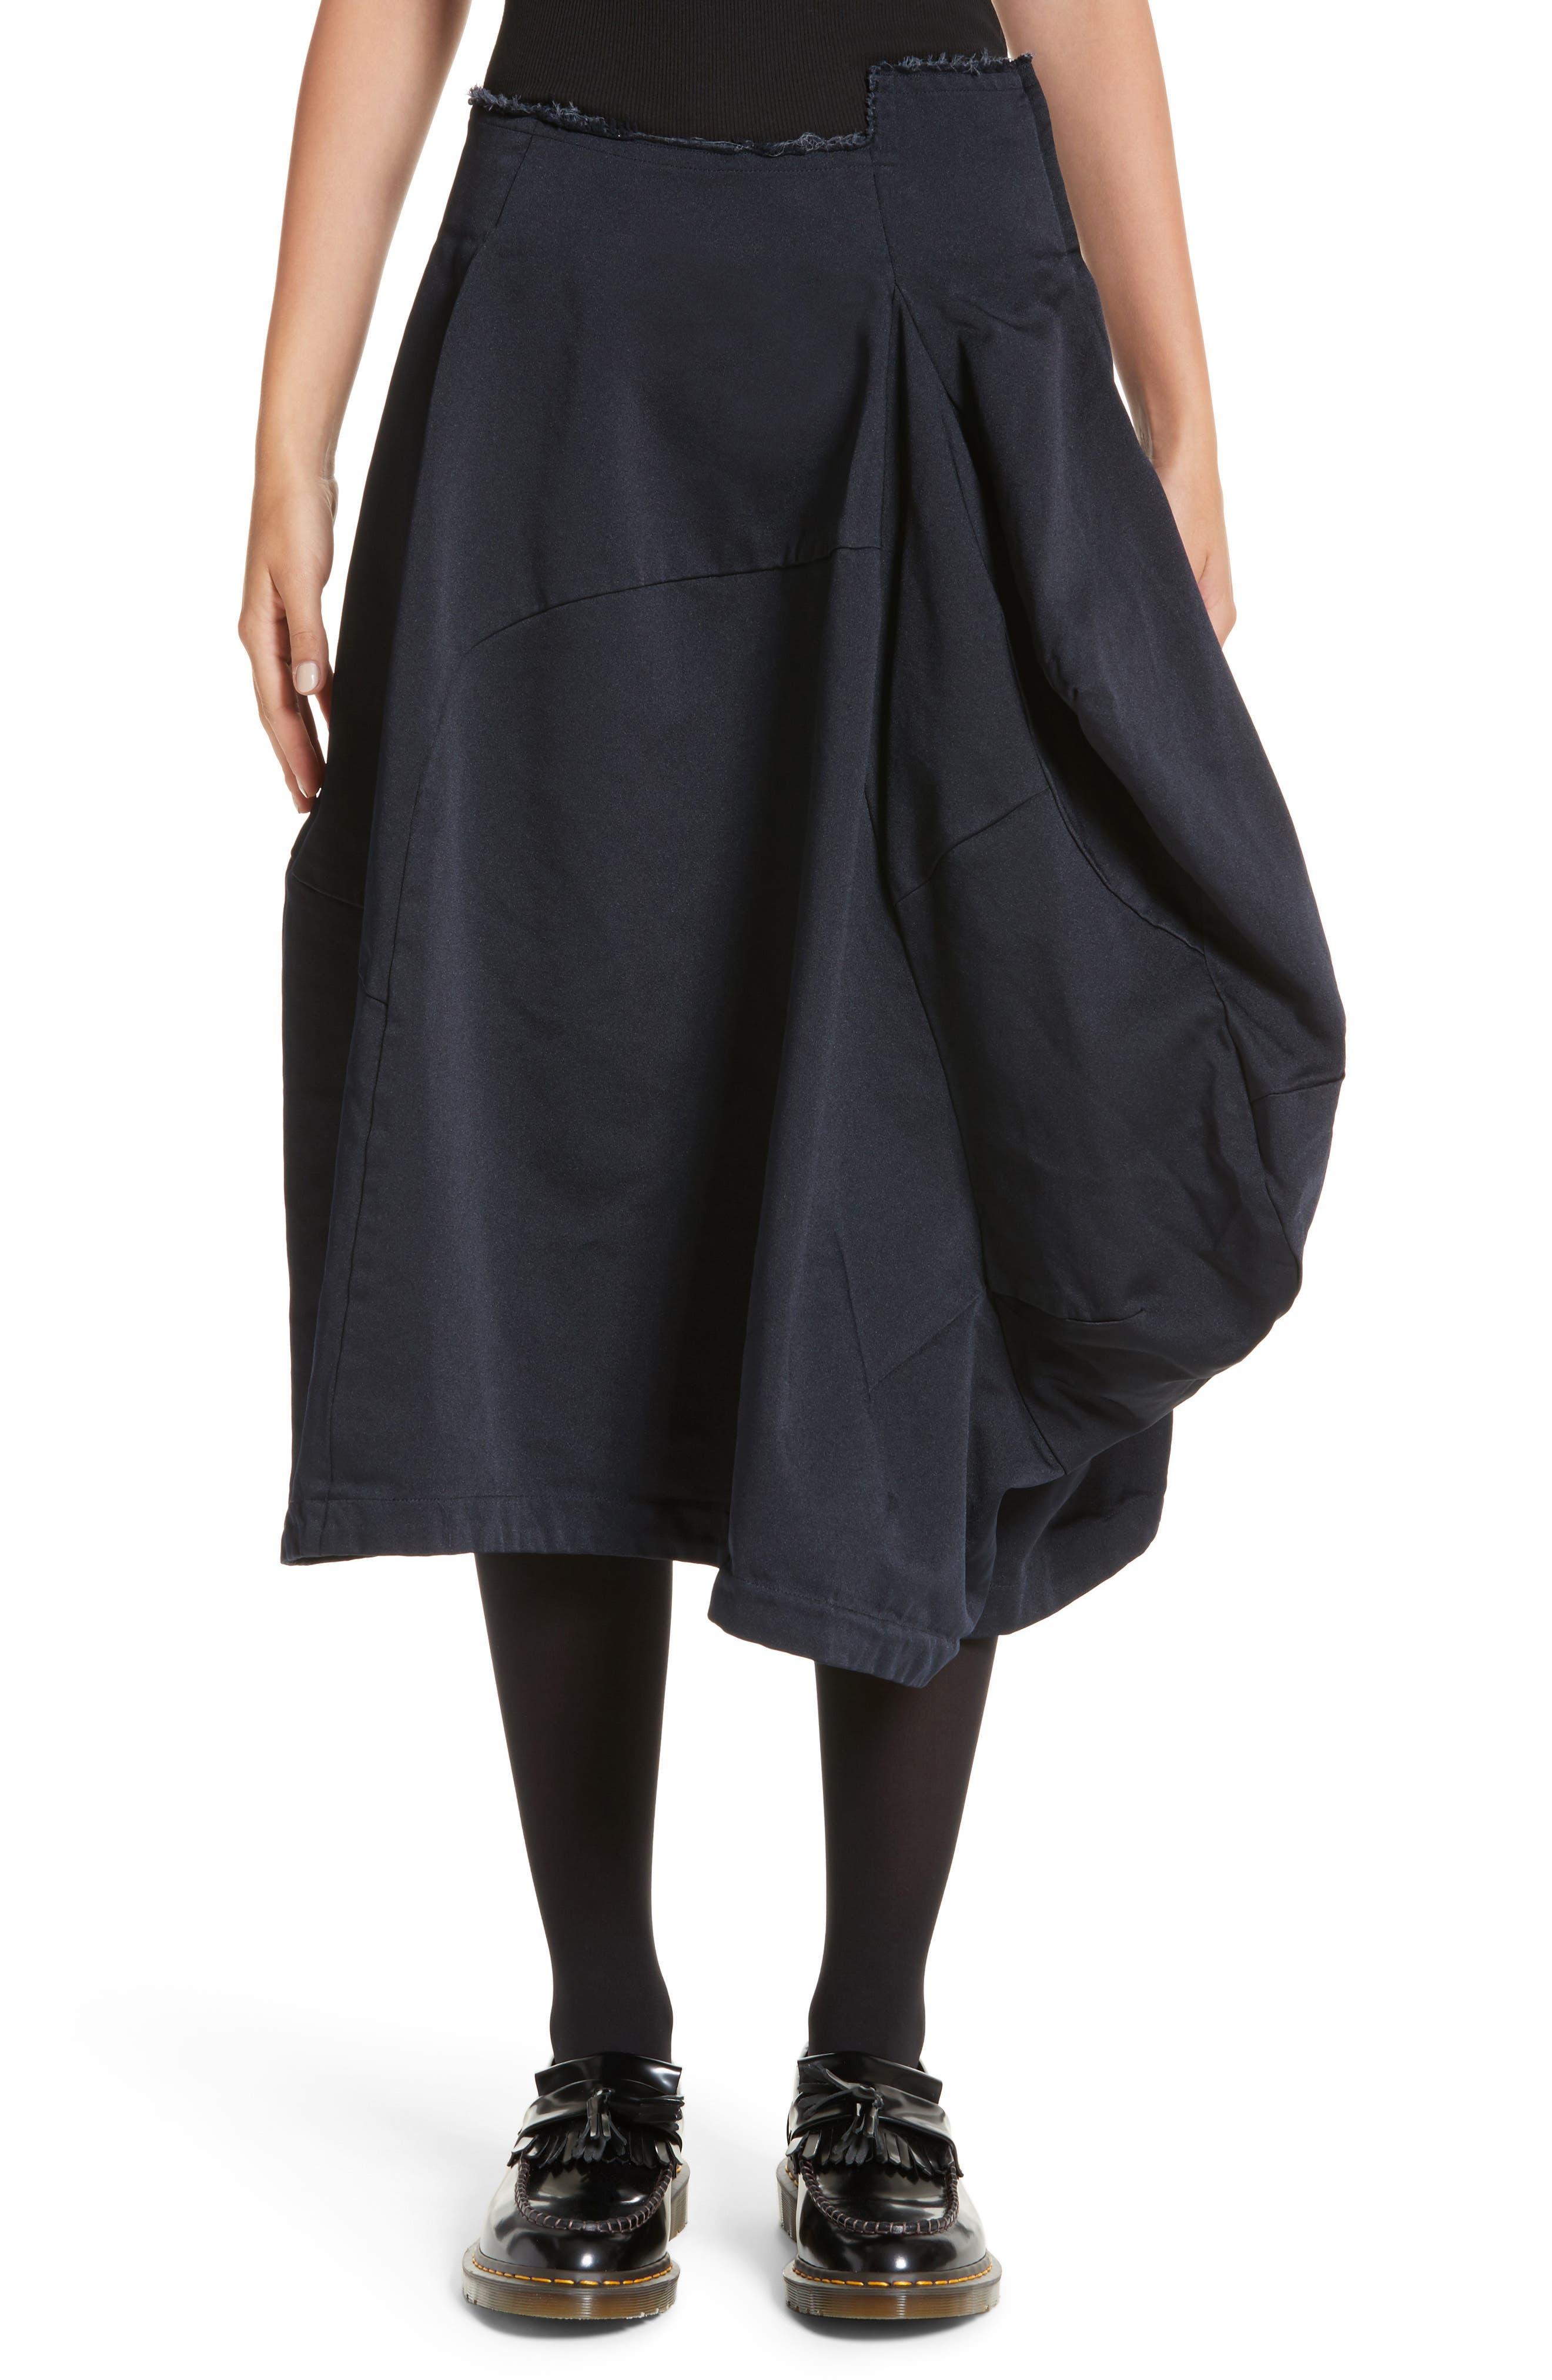 Alternate Image 1 Selected - Comme des Garçons Origami Skirt